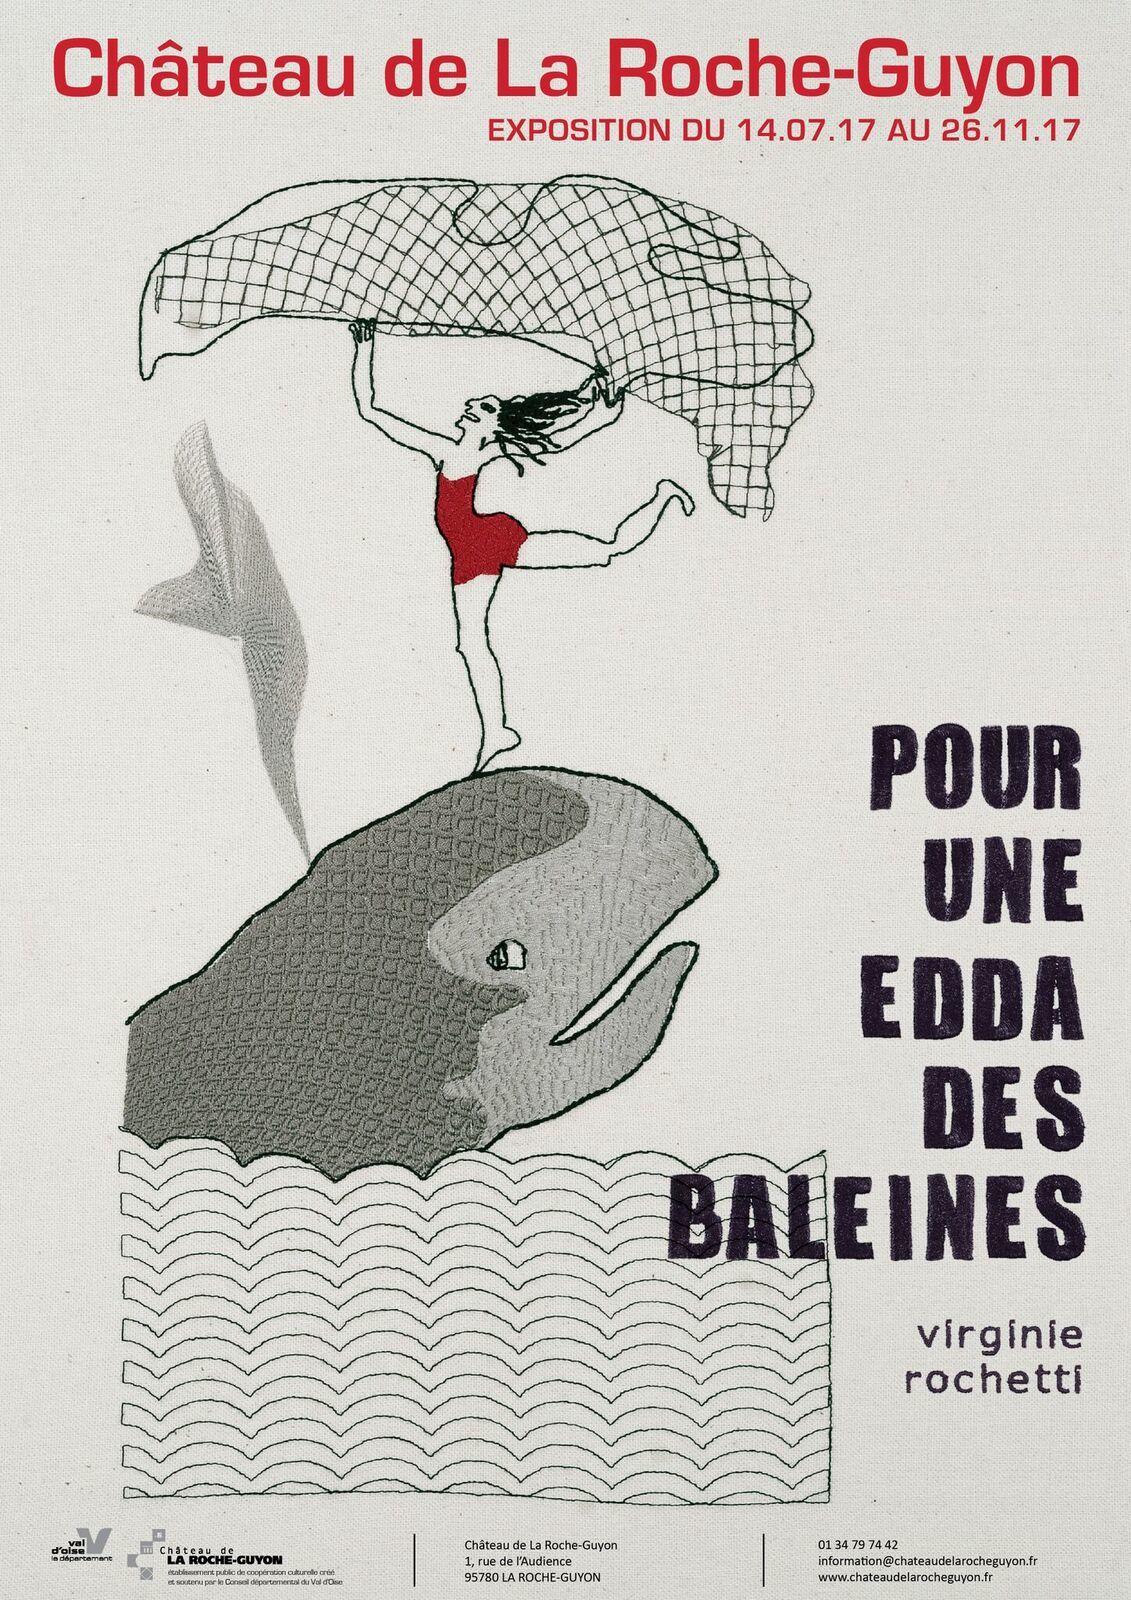 "Expo Virginie Rochetti ""Pour une Edda des baleines"" Château de la Roche Guyon"